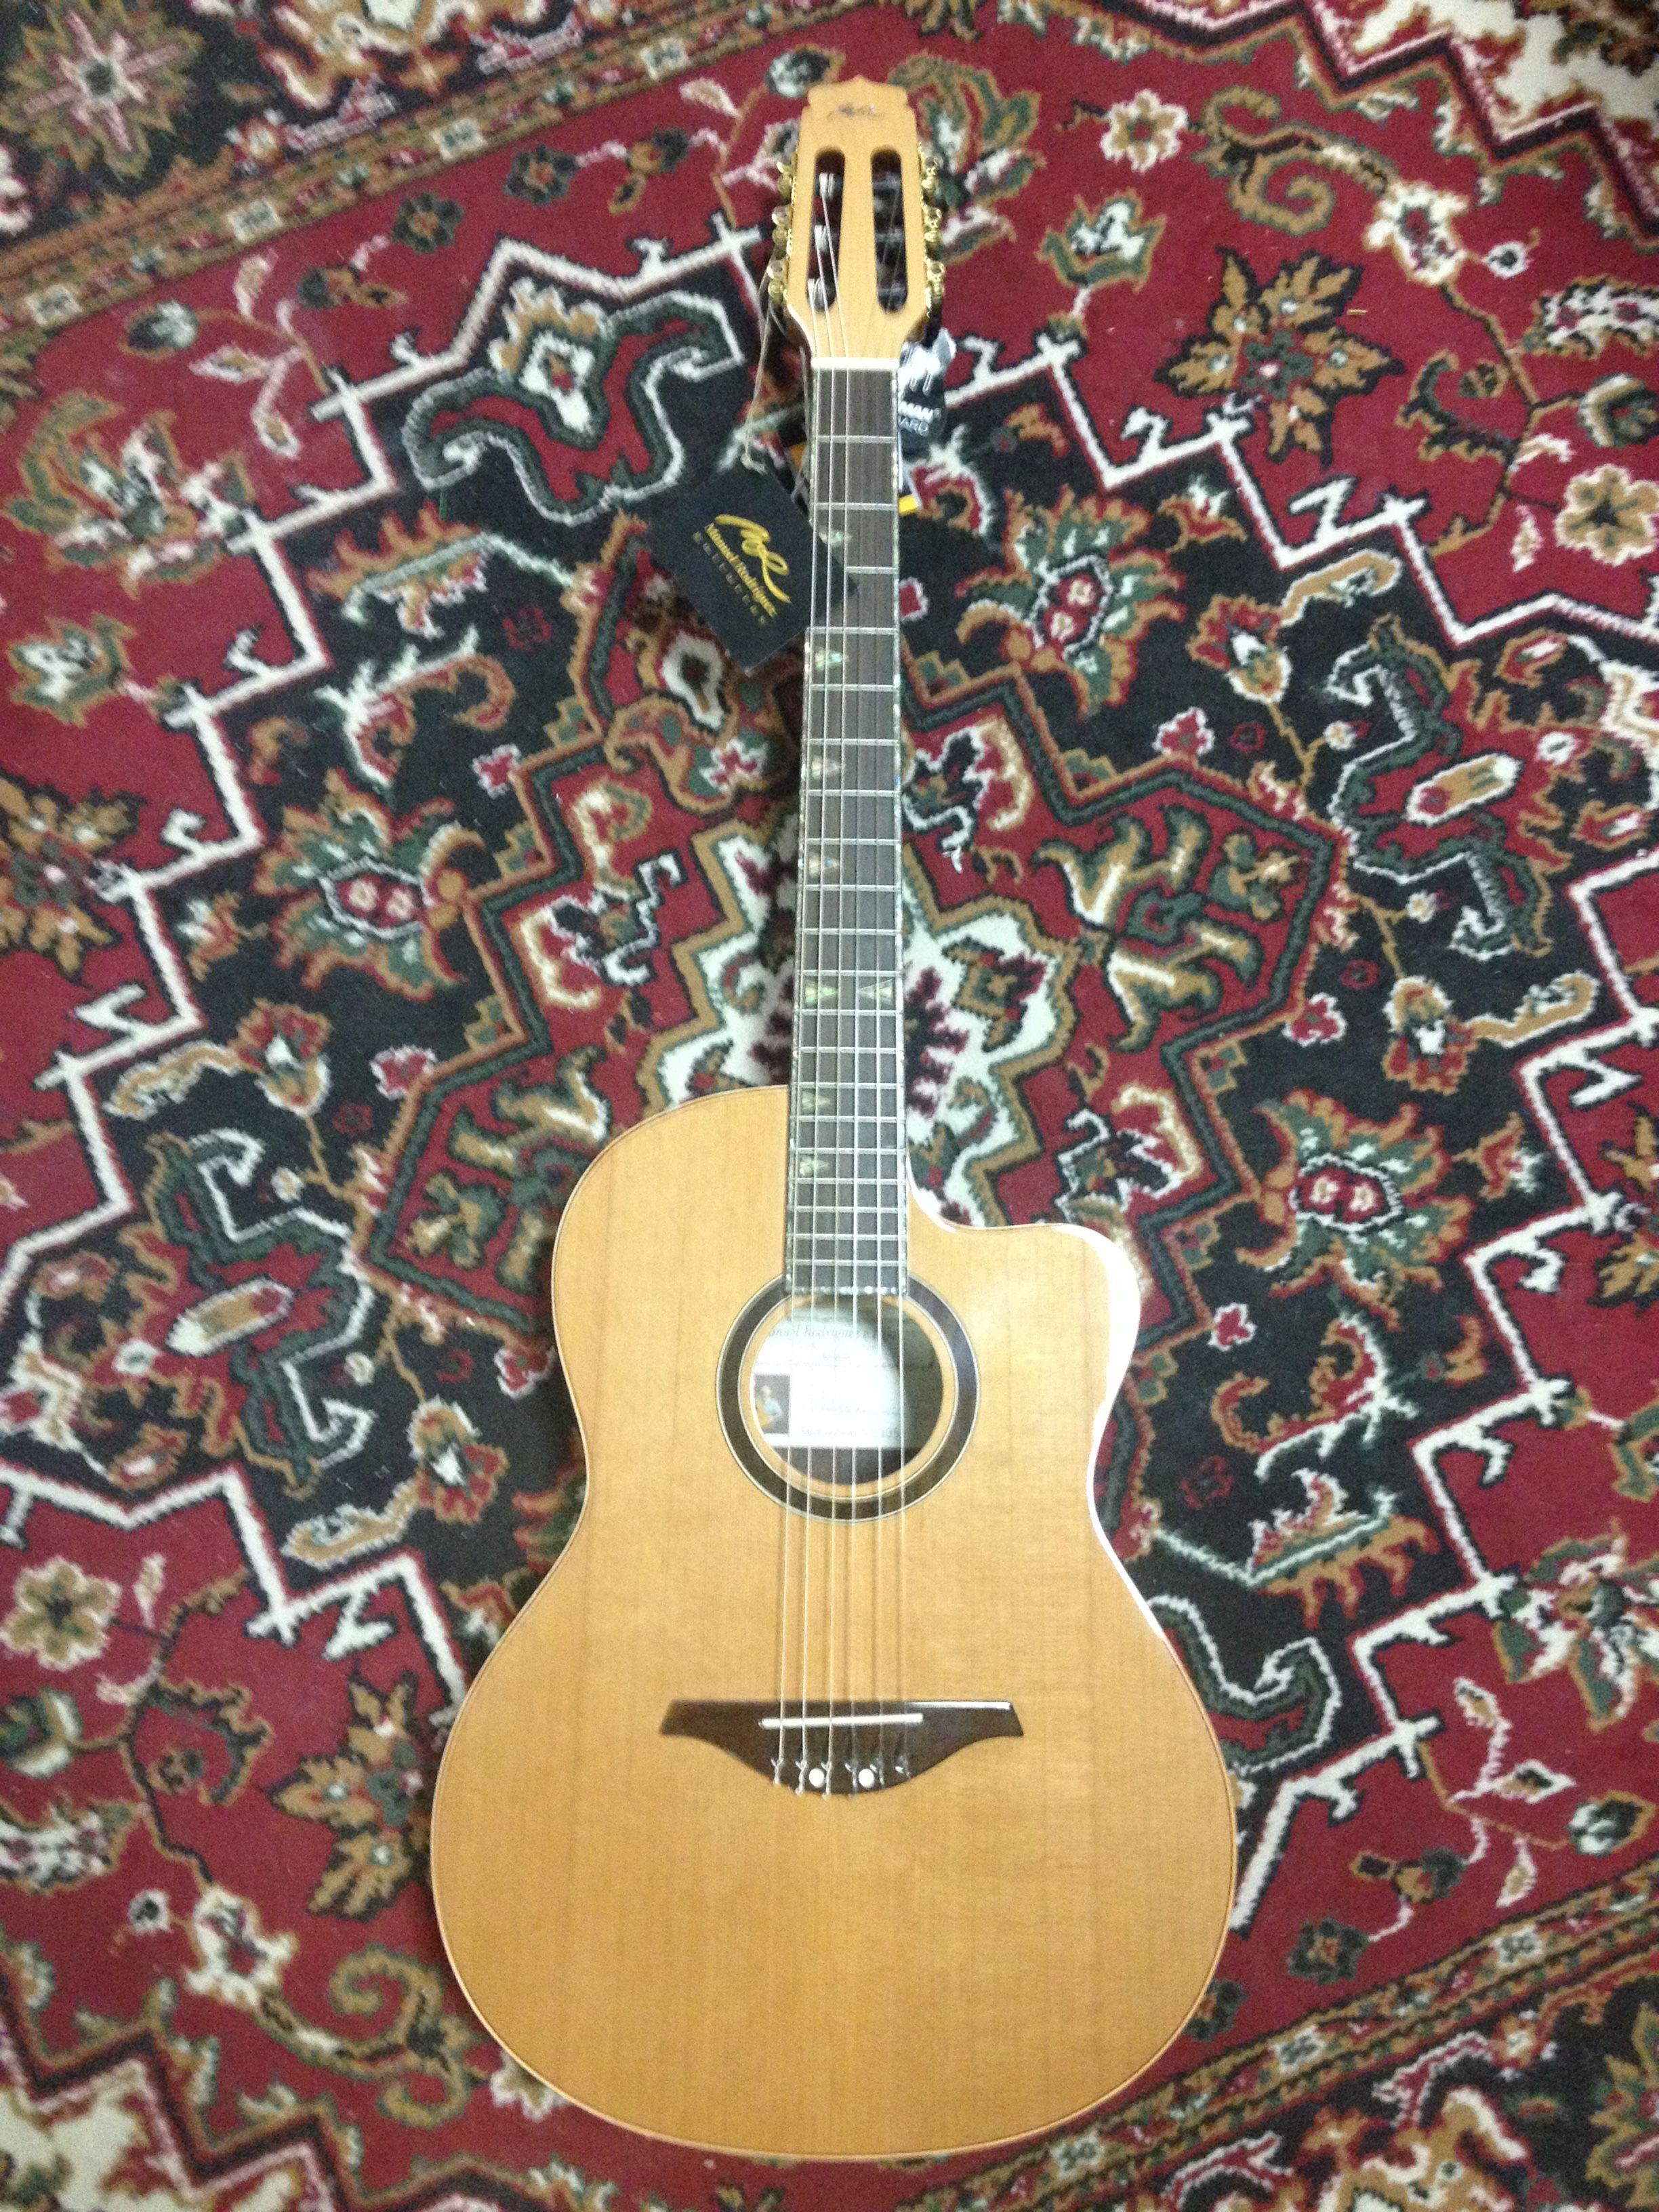 Guitarras Manuel Rodríguez - Made in Spain